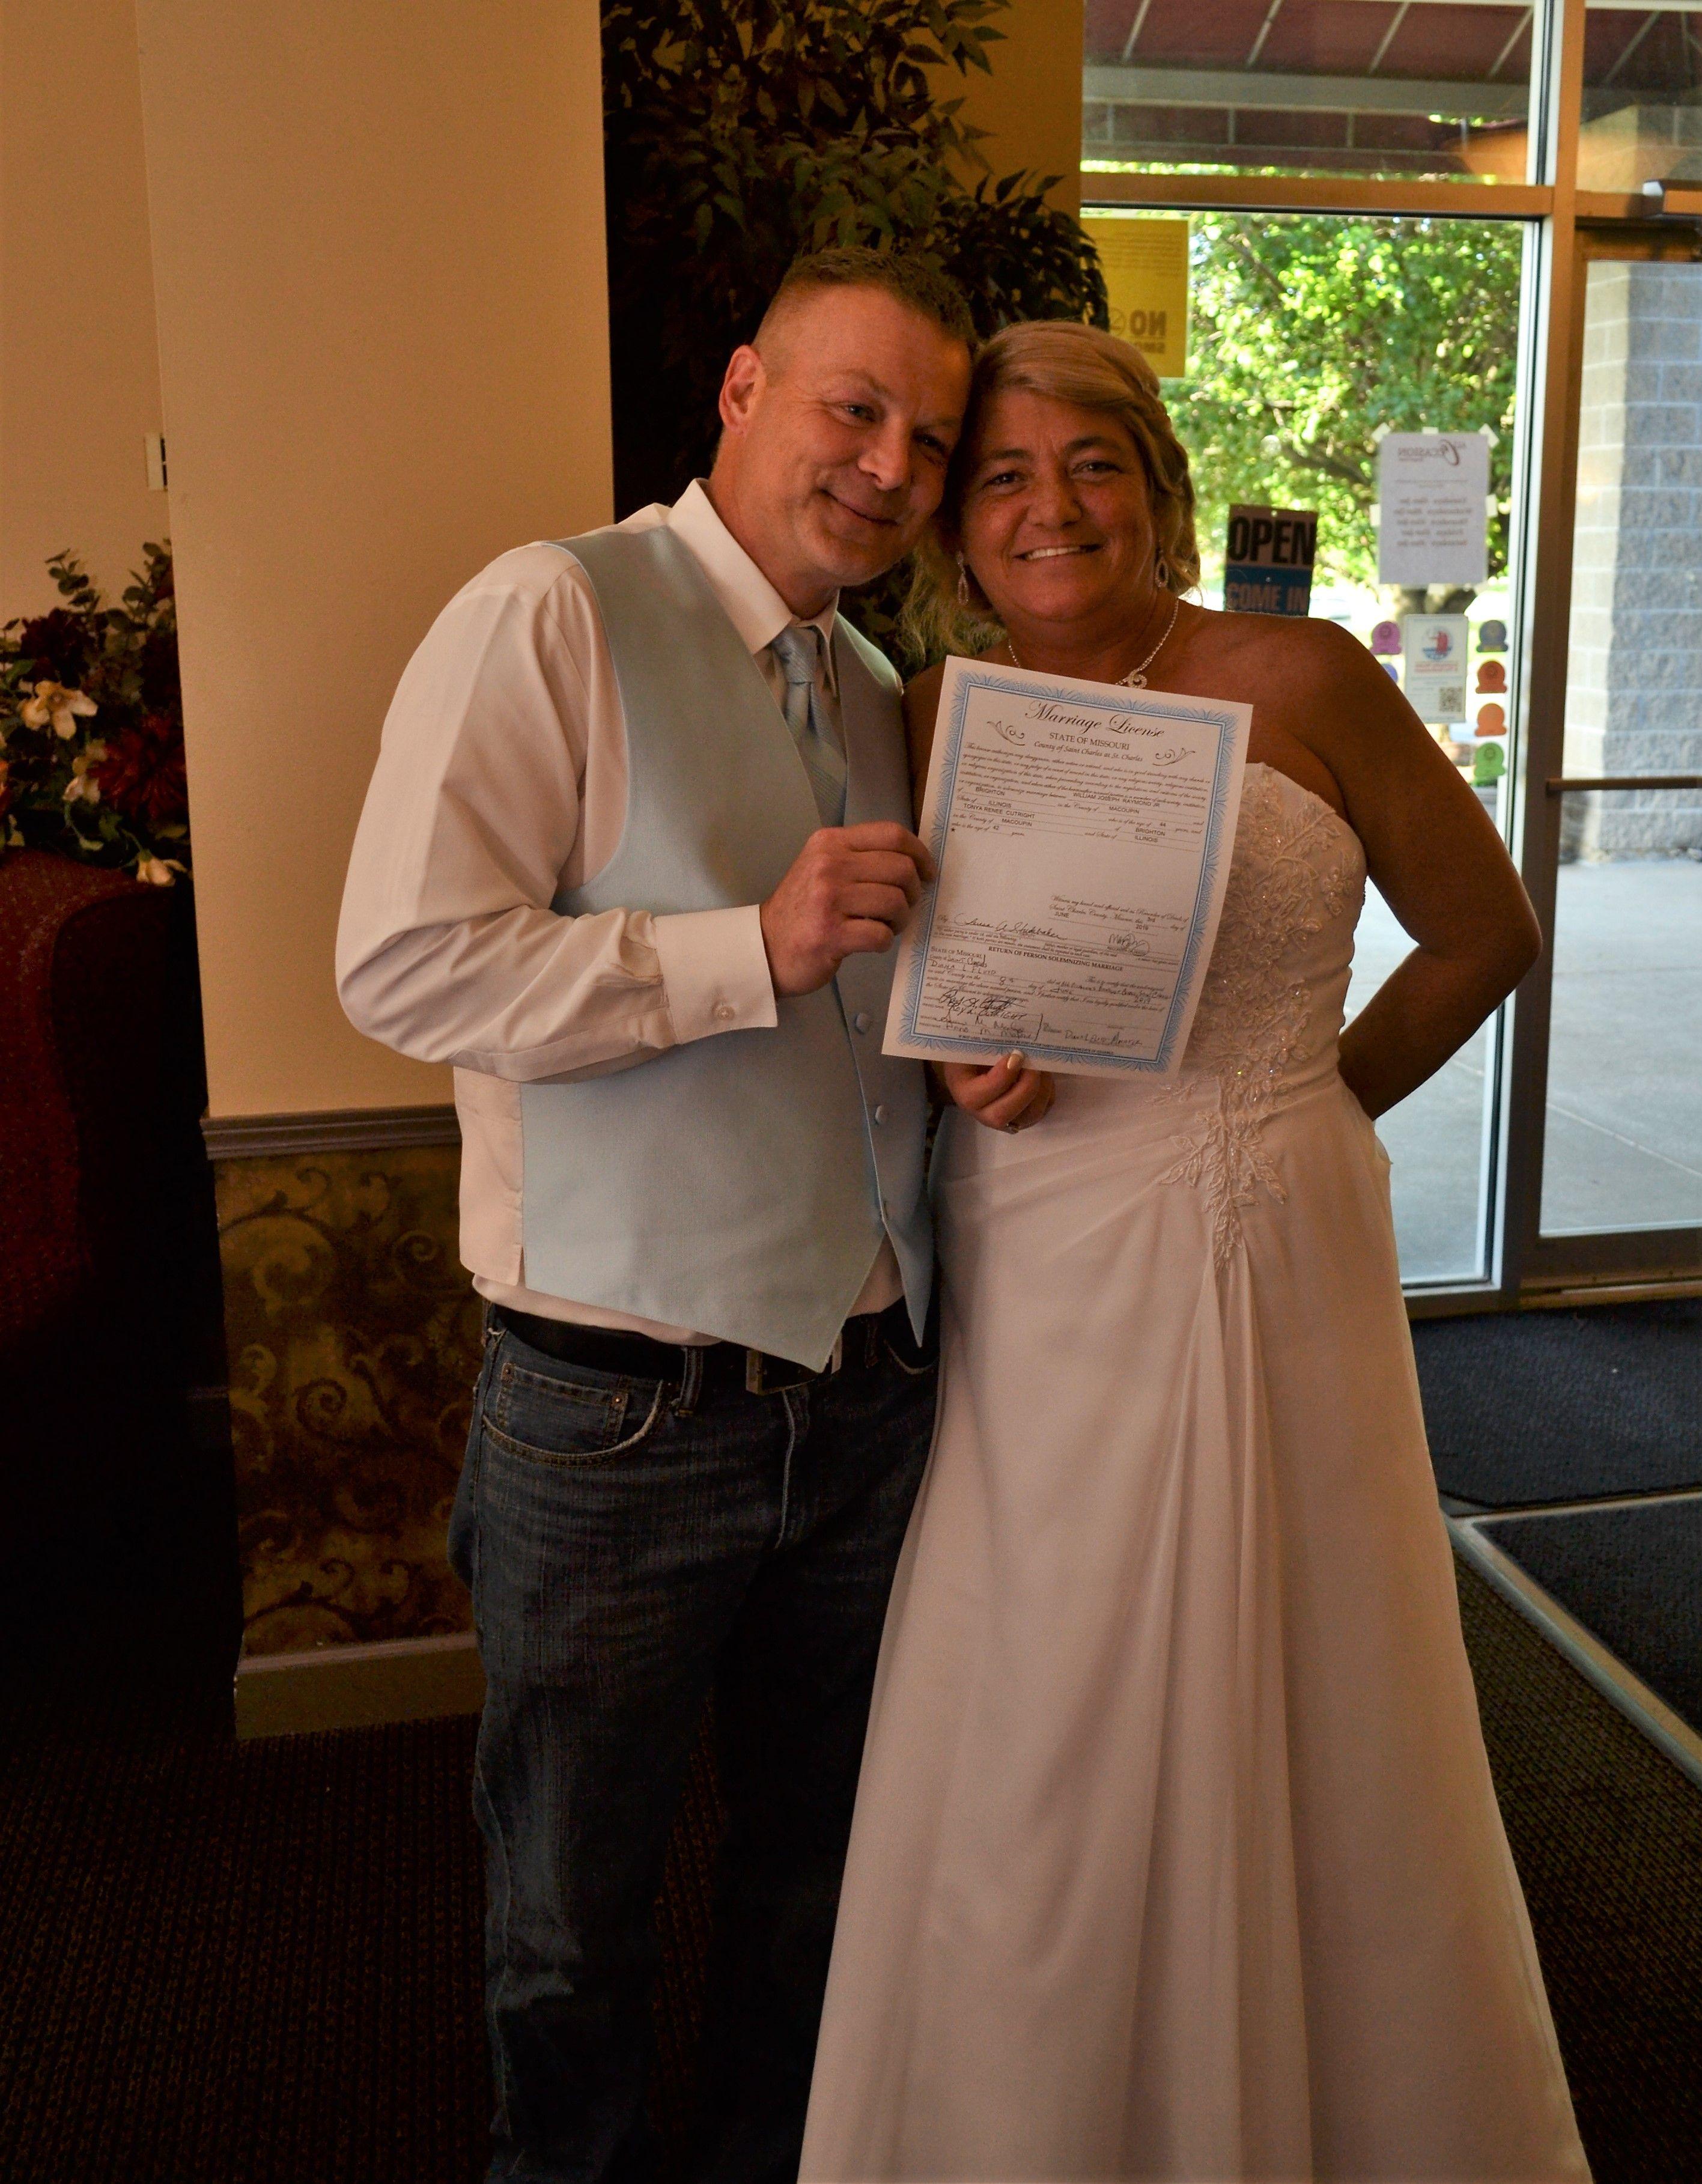 8000fc0a5aa7789c1c80ccad4f904da1 - How To Get Licensed To Marry Someone In Missouri